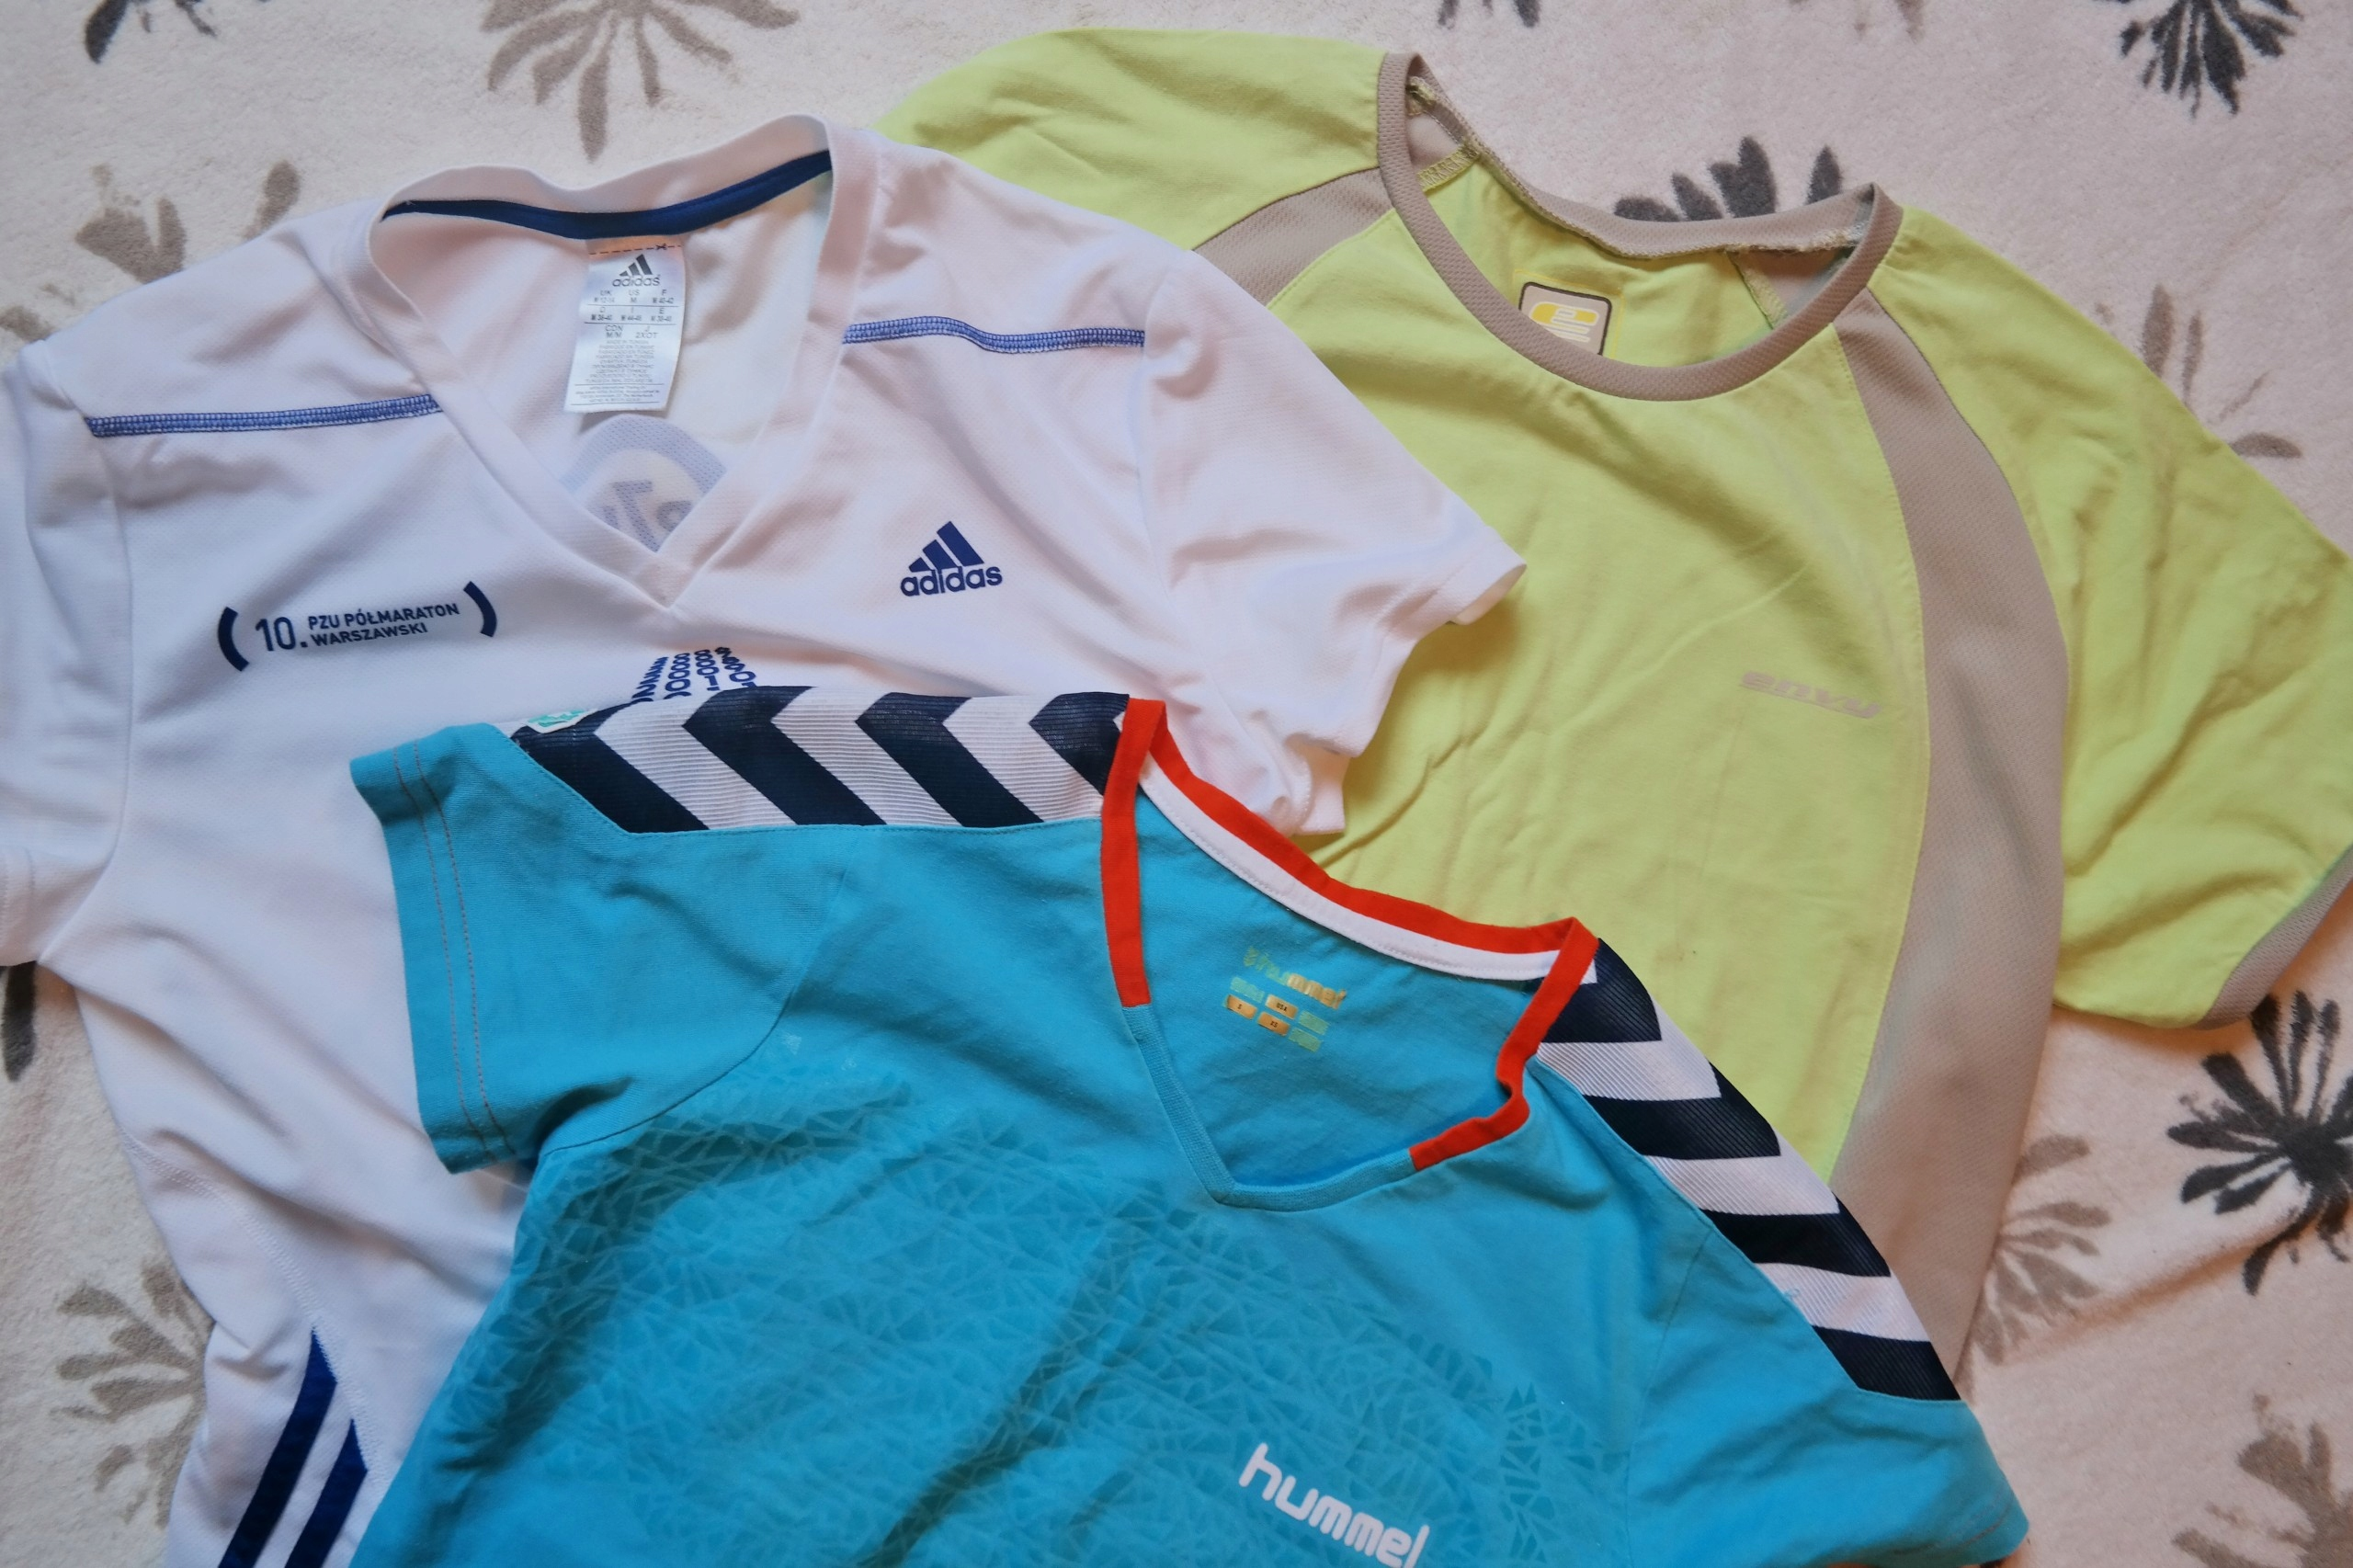 44191fbd9 ADIDAS HUMMEL 3 koszulki damskie sportowe r. 38 M - 7433950900 ...